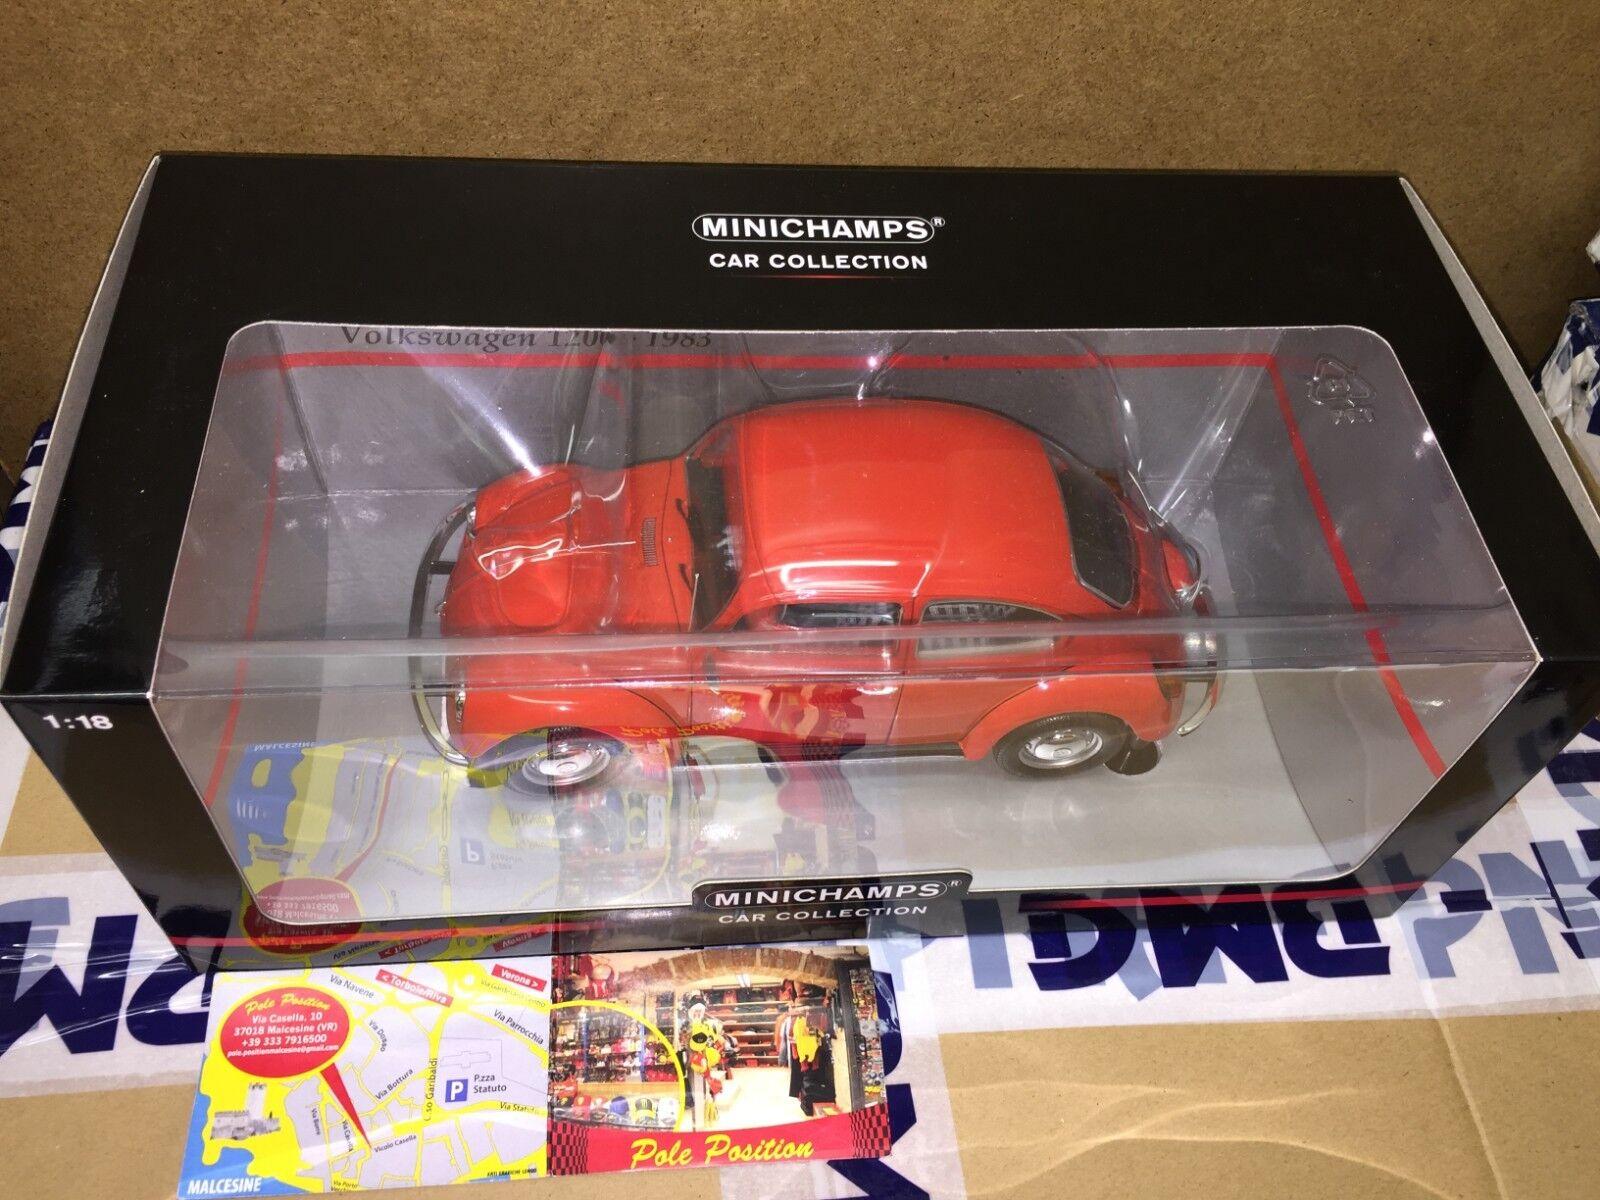 150057100 MINICHAMPS 1 18 VOLKSWAGEN 1200 RED 1983 NEW FREE SHIPPING WORLDWIDE